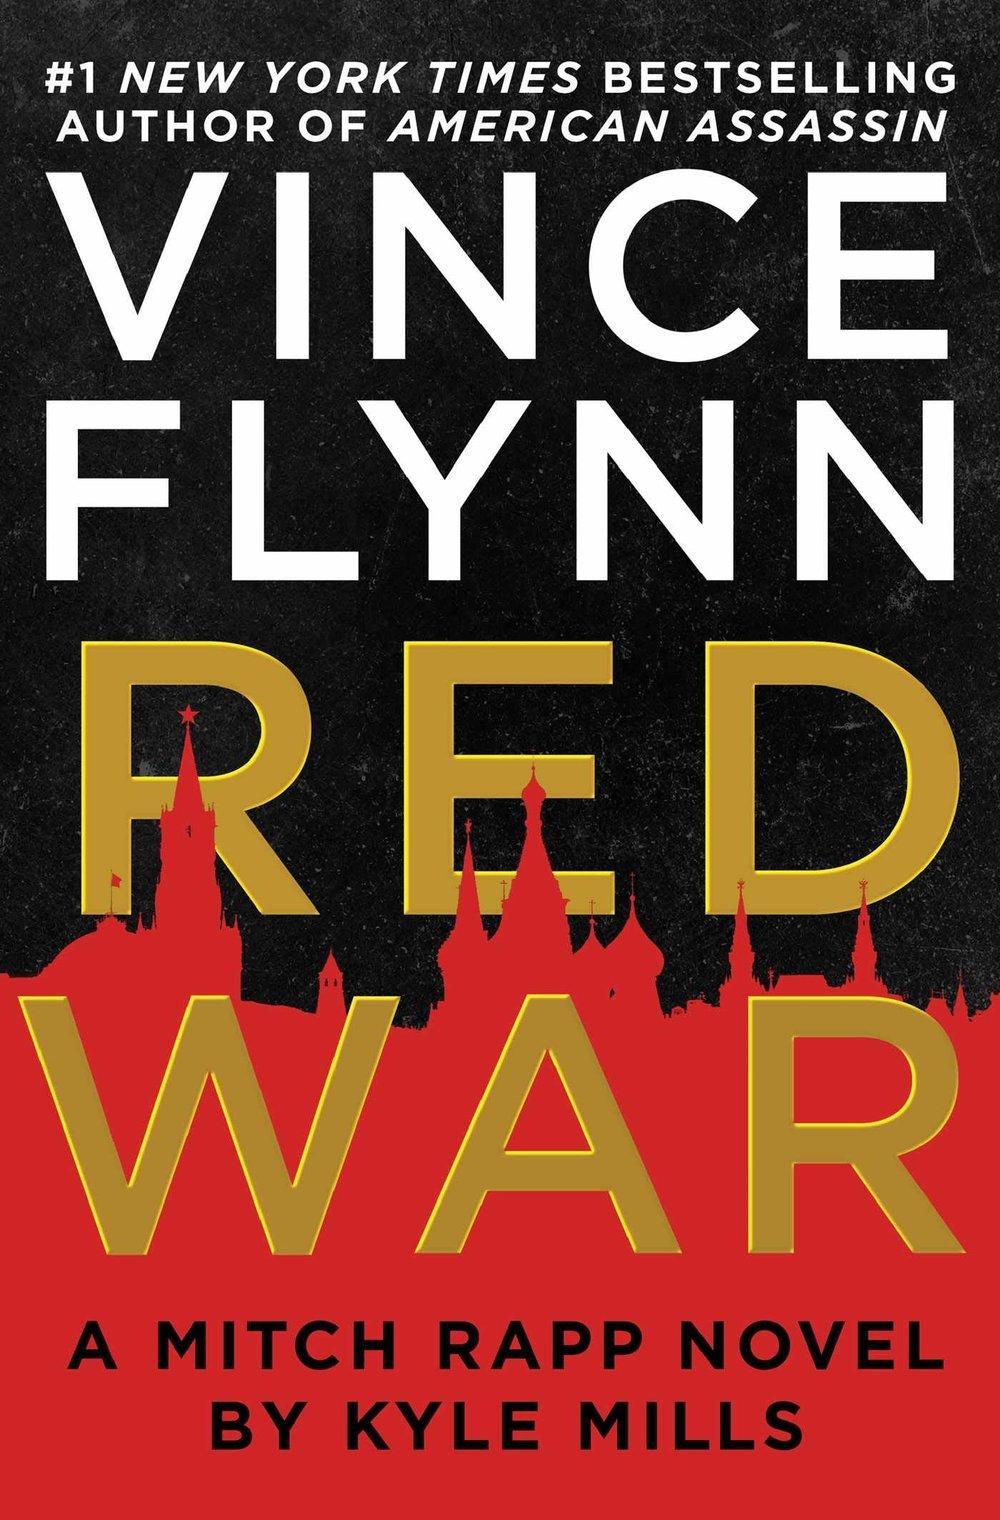 Red War_Kyle Mills_Vince Flynn.jpg